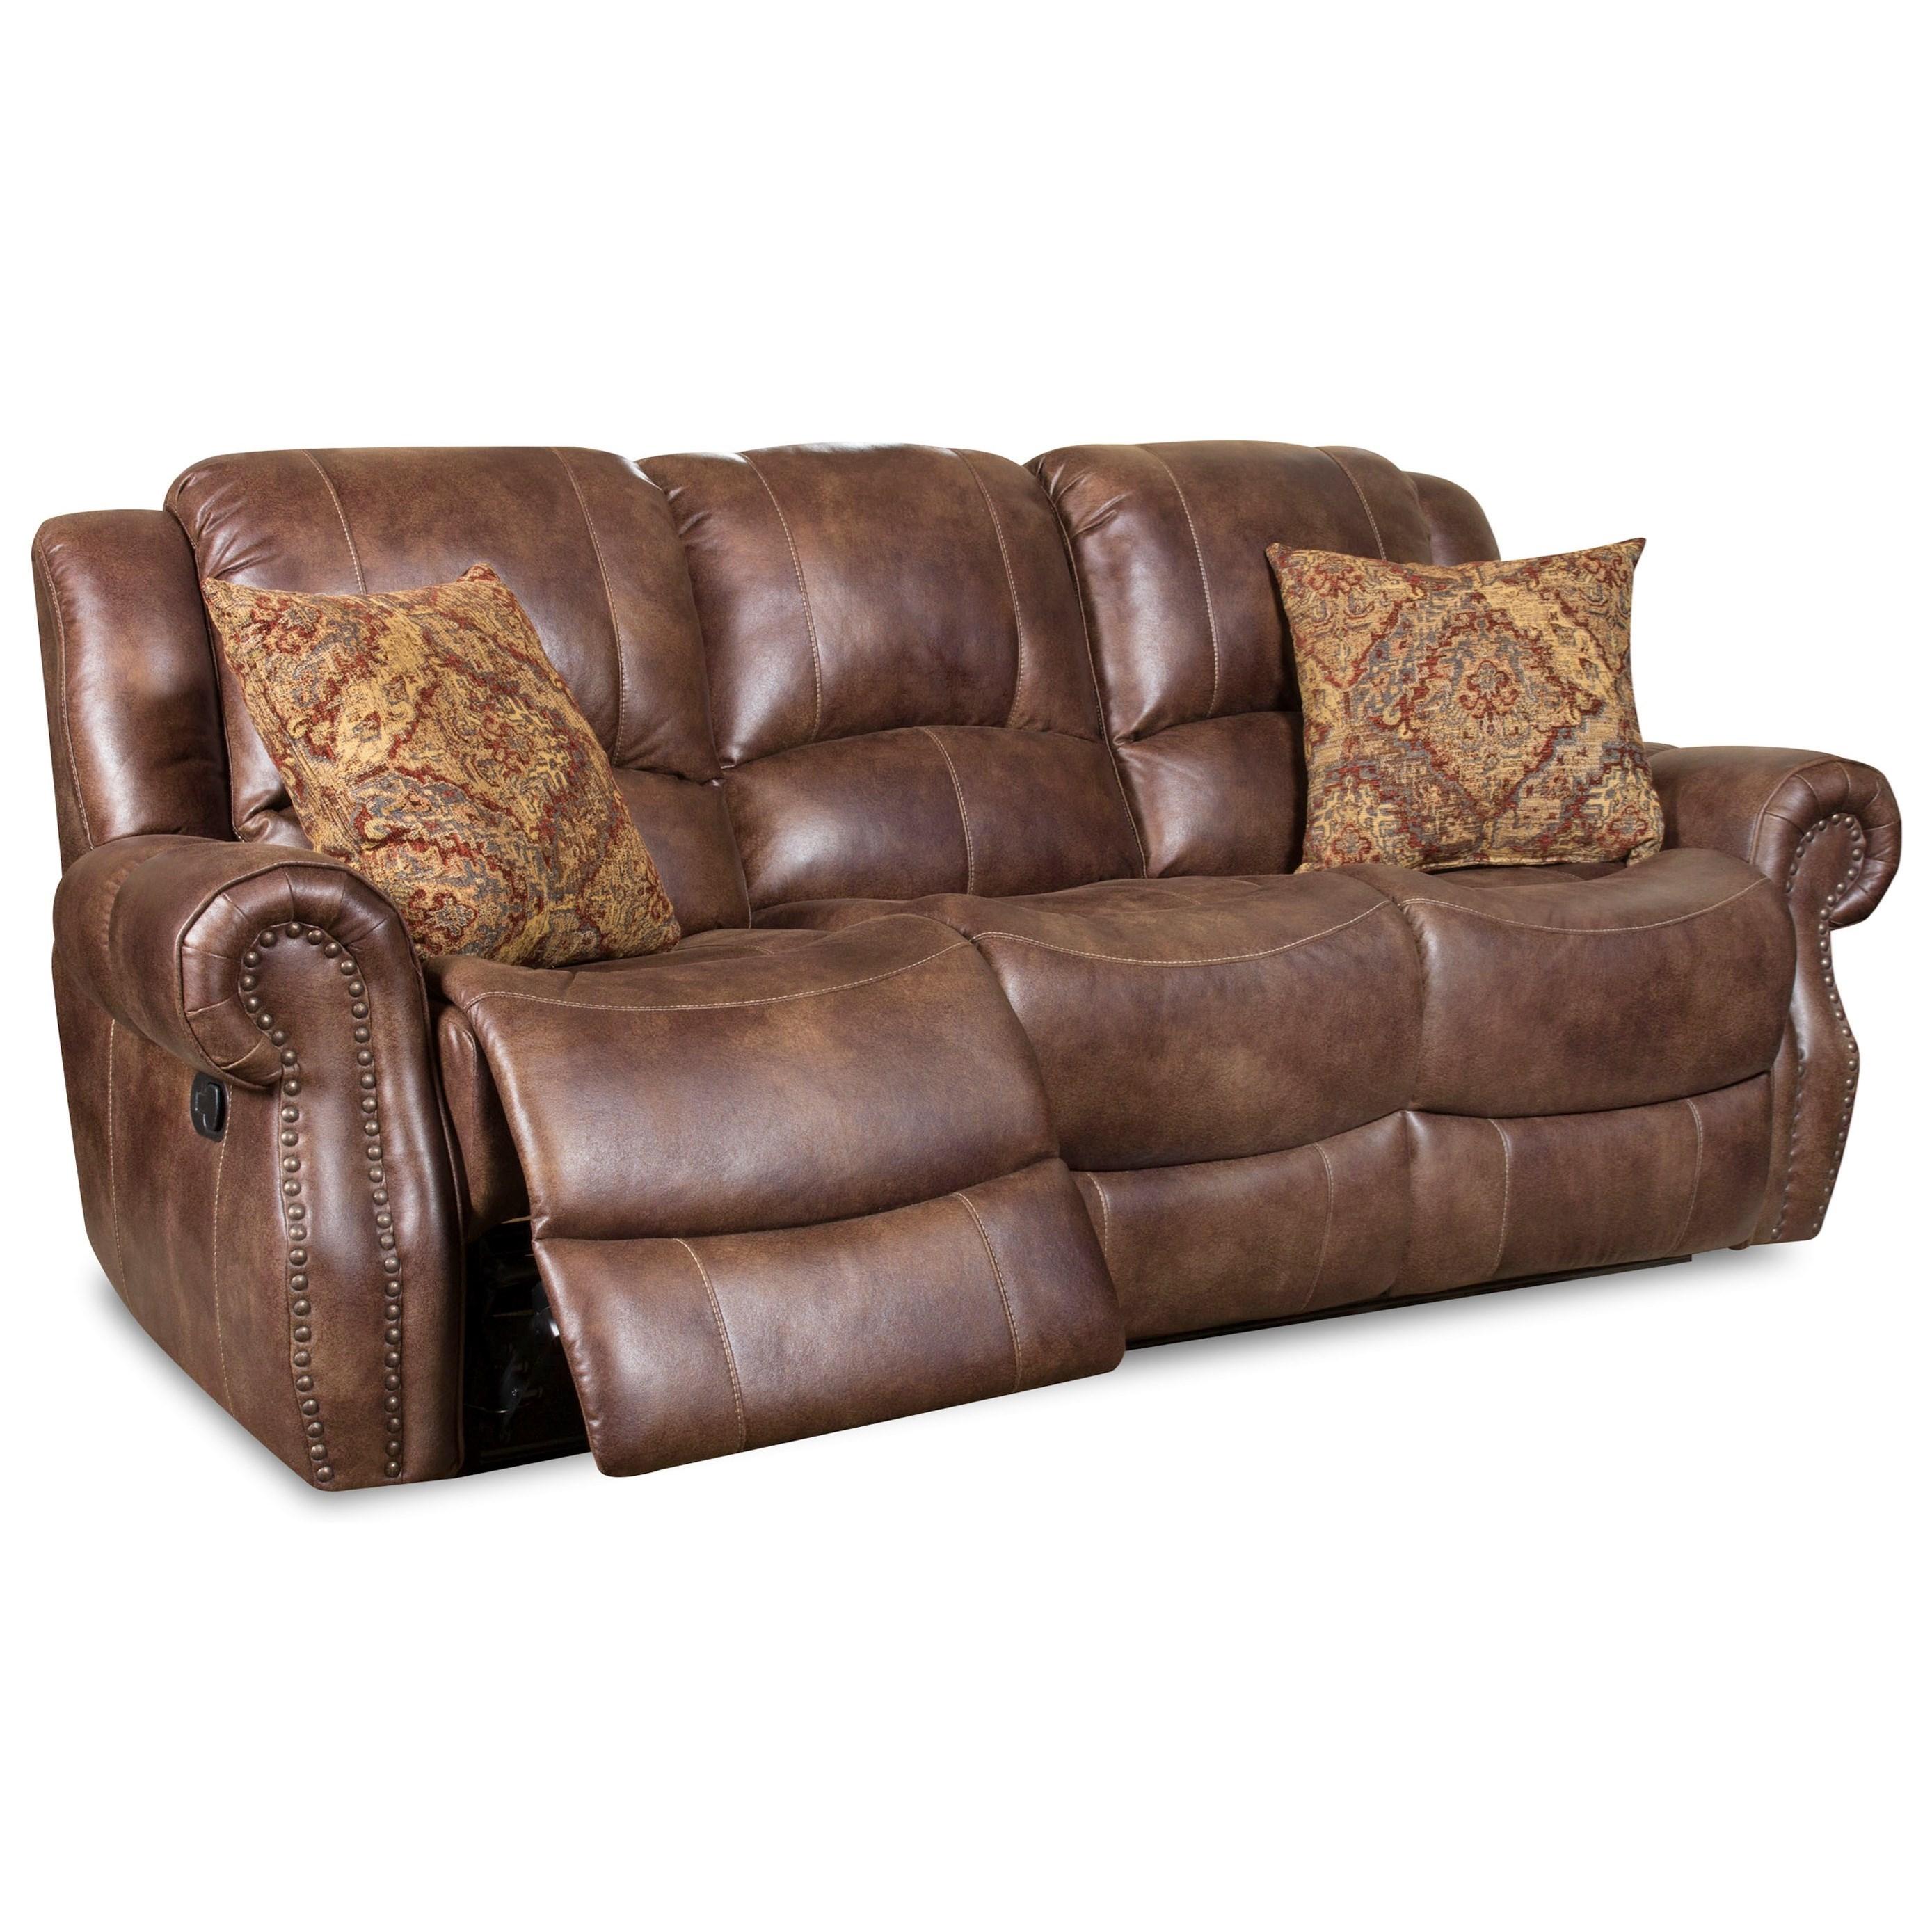 corinthian 69901 69901 30 recline sofa household. Black Bedroom Furniture Sets. Home Design Ideas